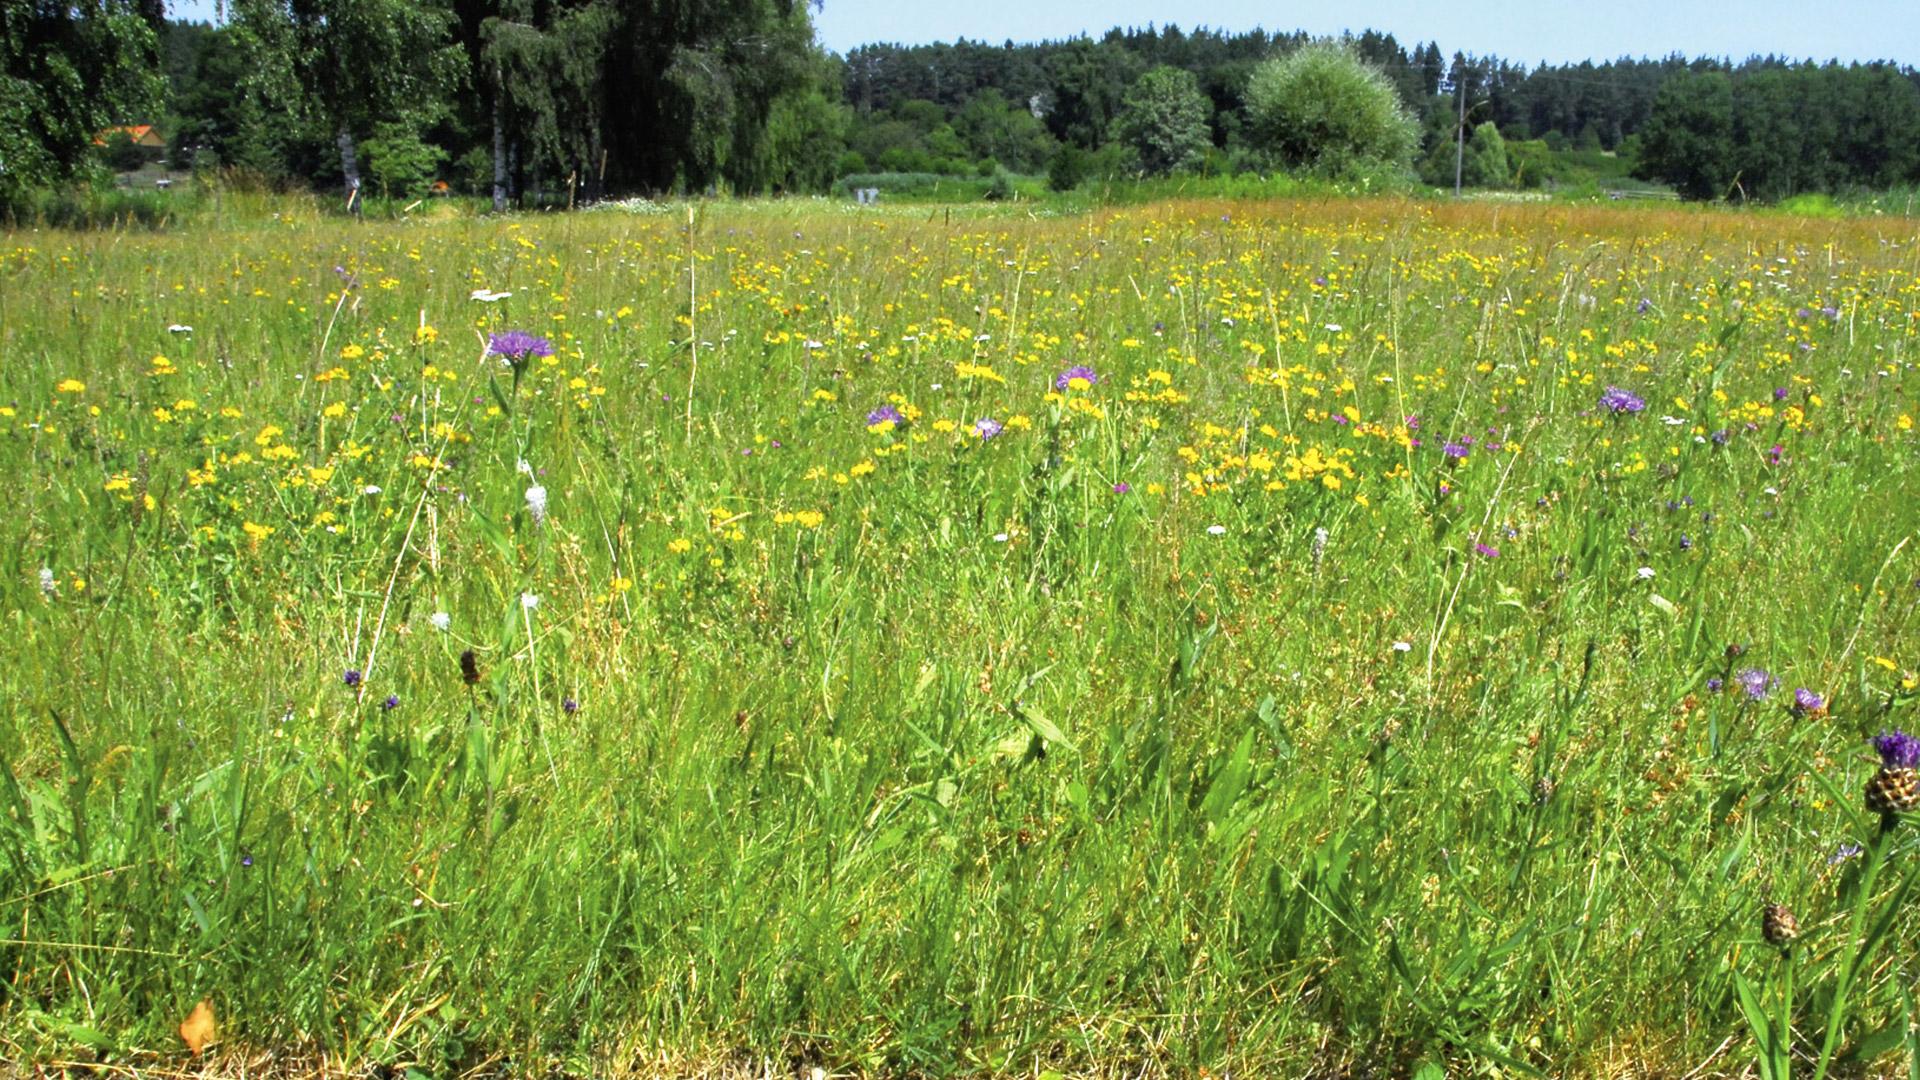 Kräuter-Gräser-Rasen